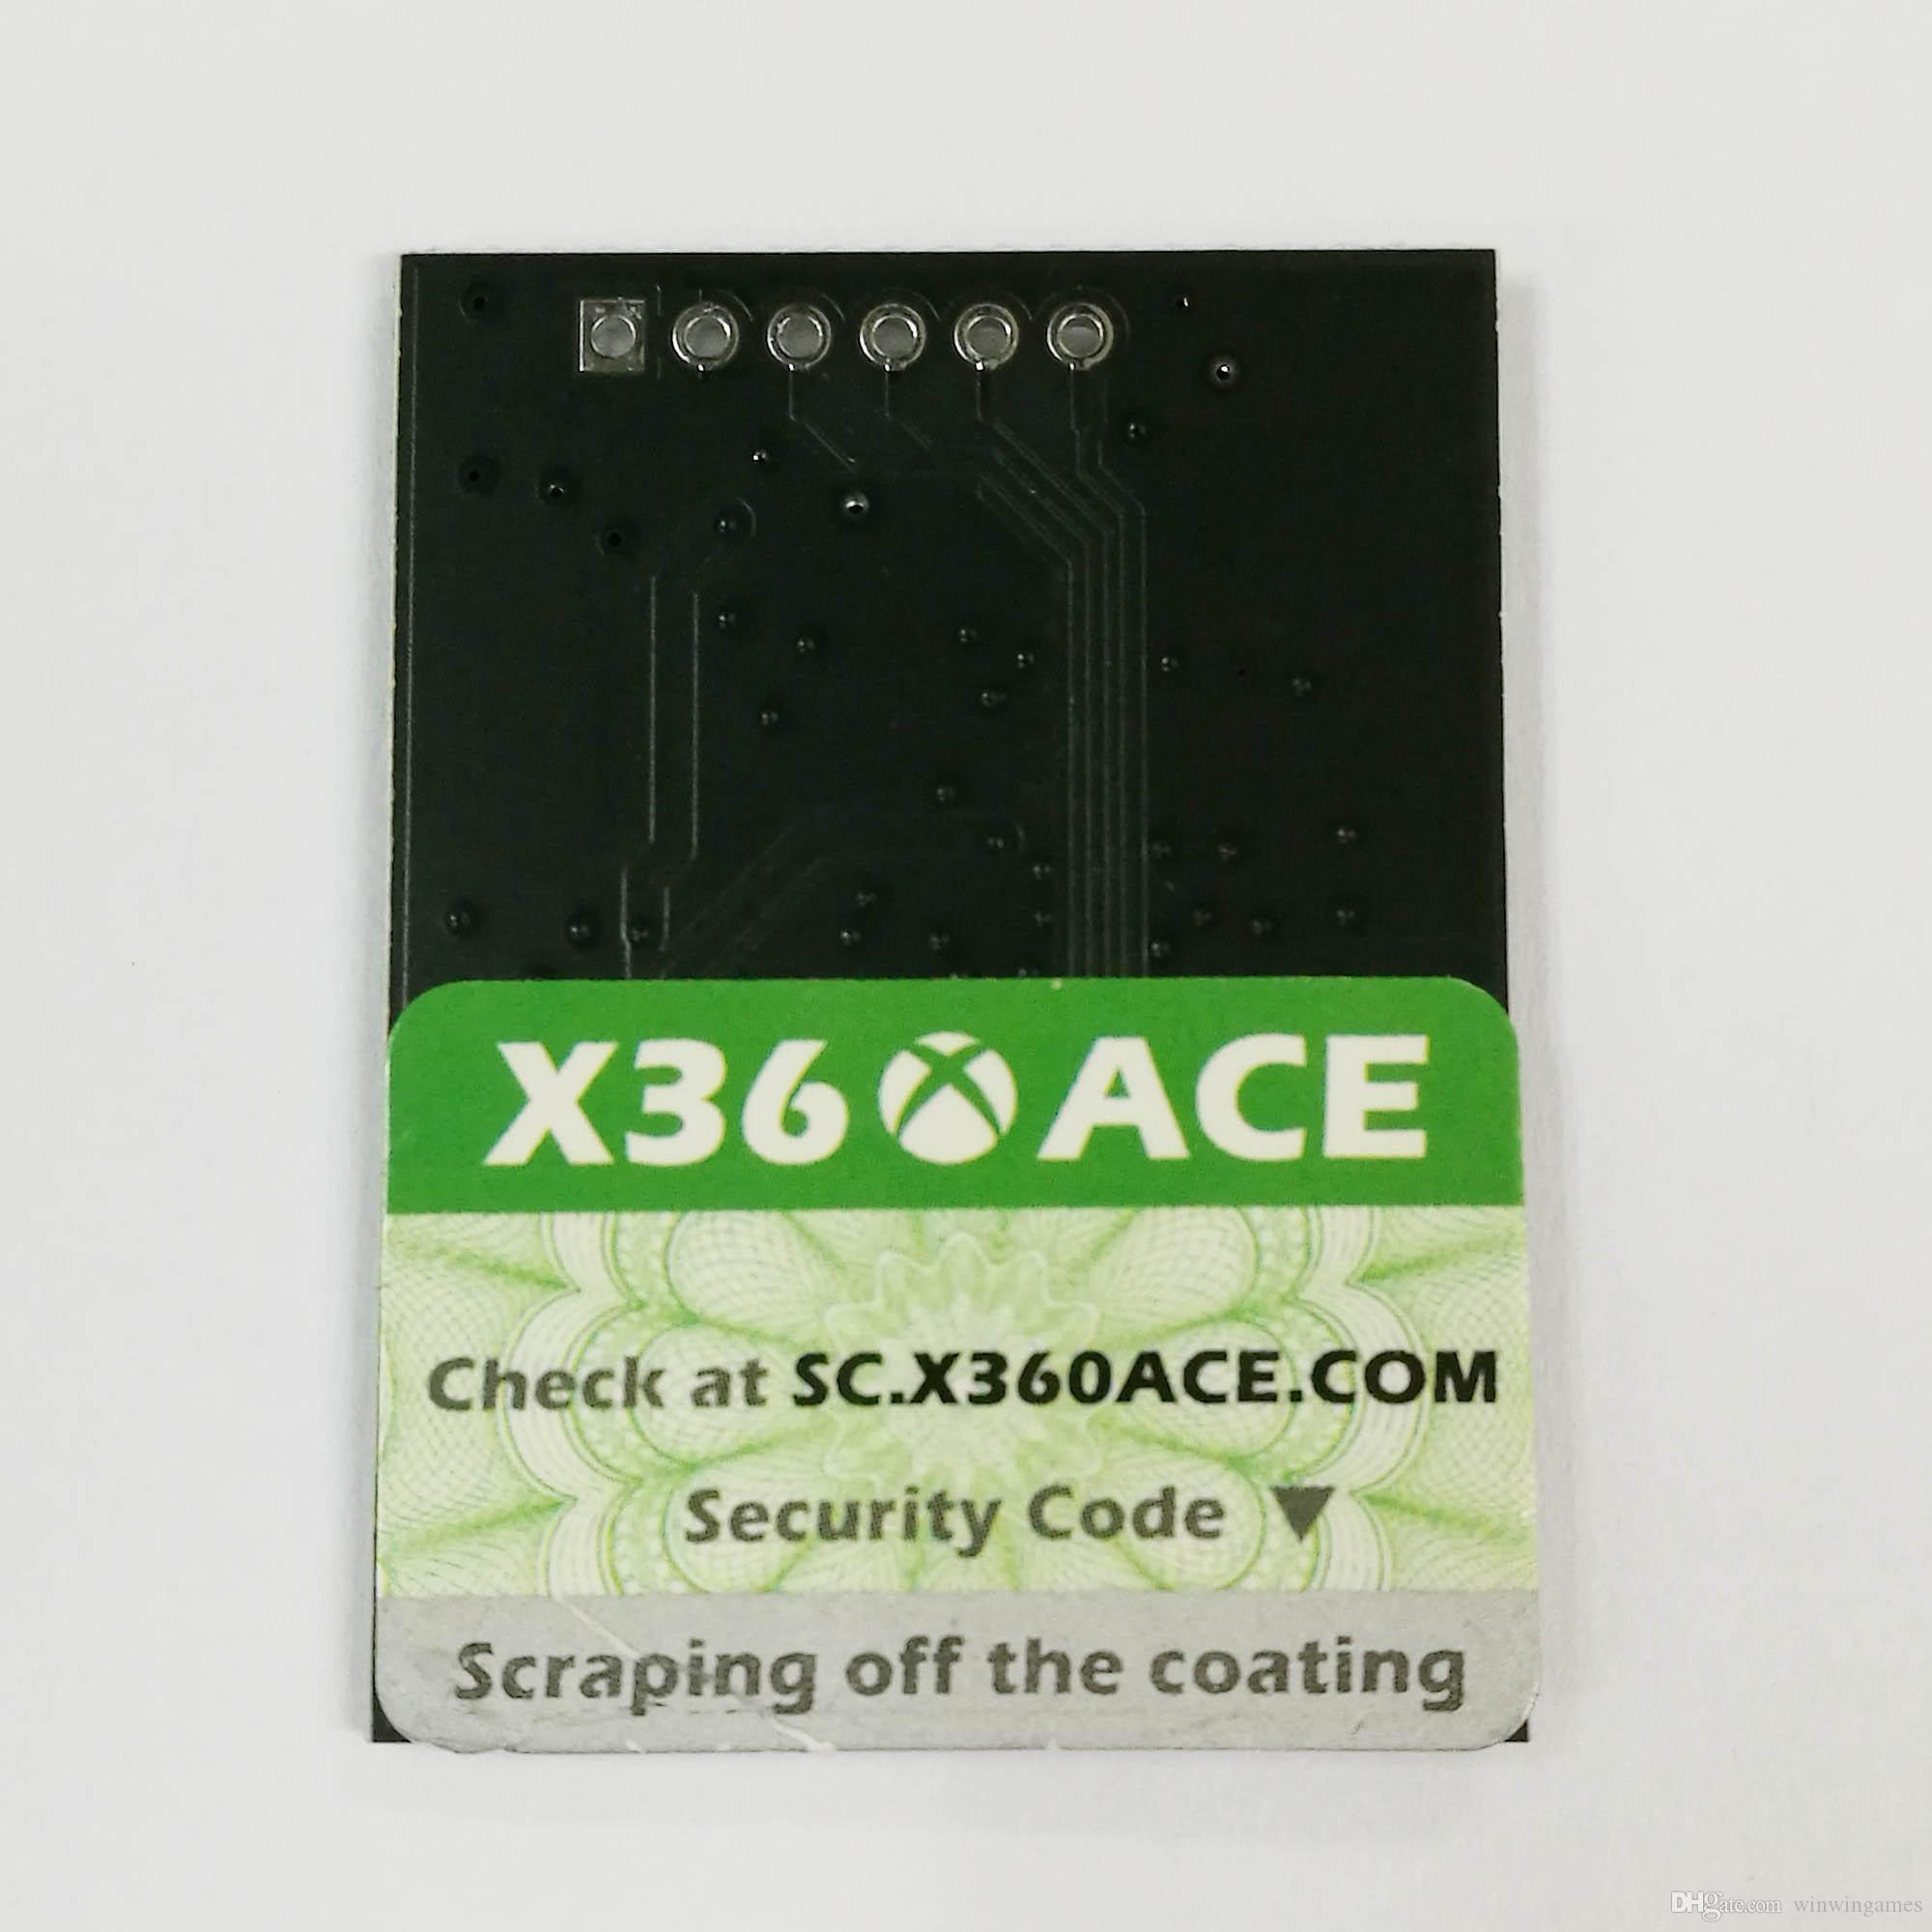 X360 ACE V5 أسرع وأكثر ثباتًا لـ X360ACE V5 مع 150MHZ مع كابل نحيف